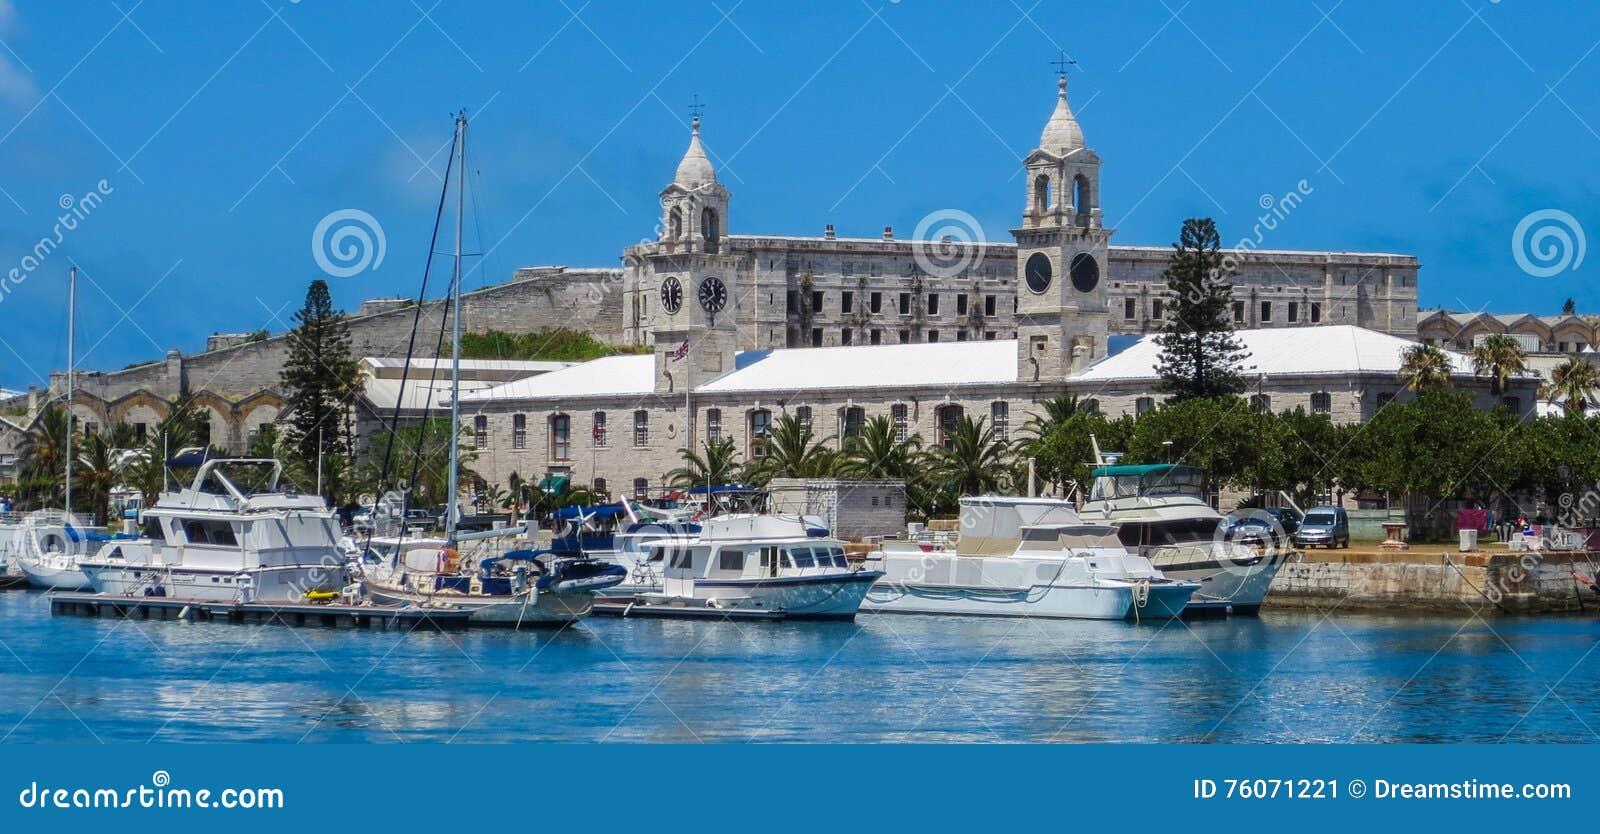 Il cantiere navale navale reale delle Bermude